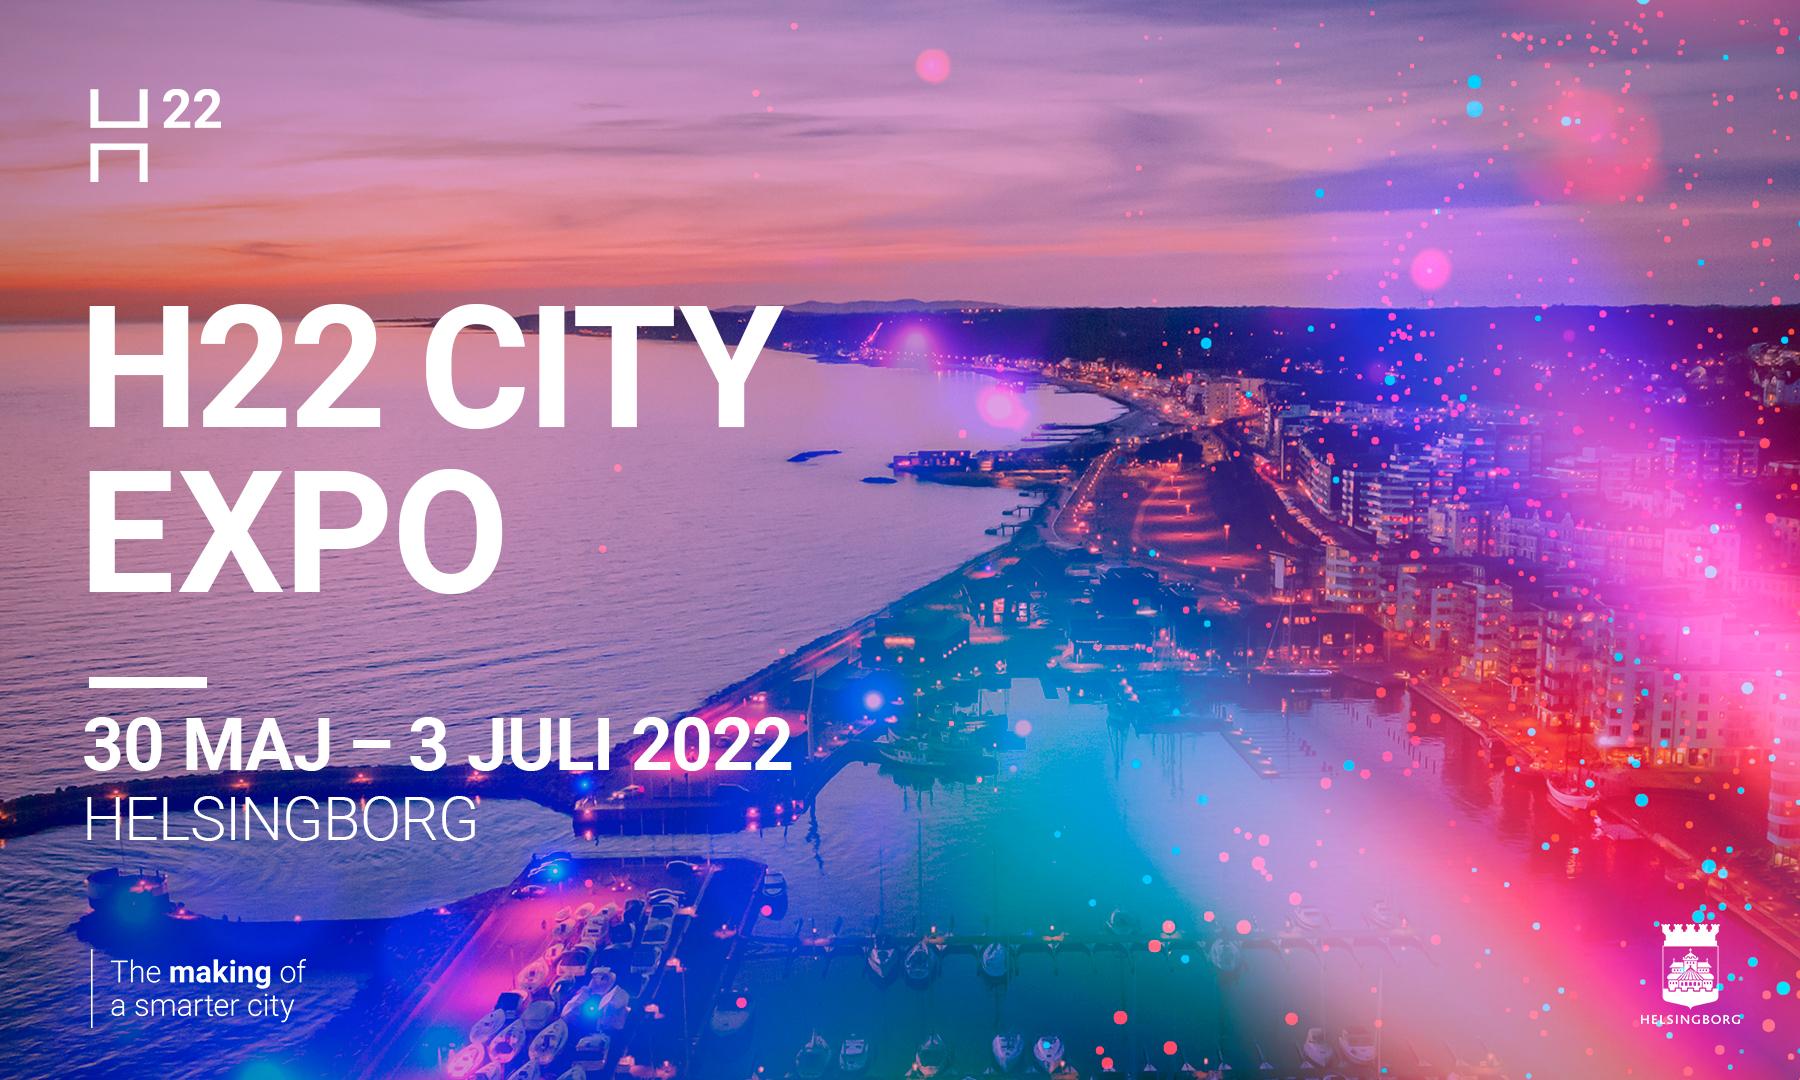 H22 City Expo